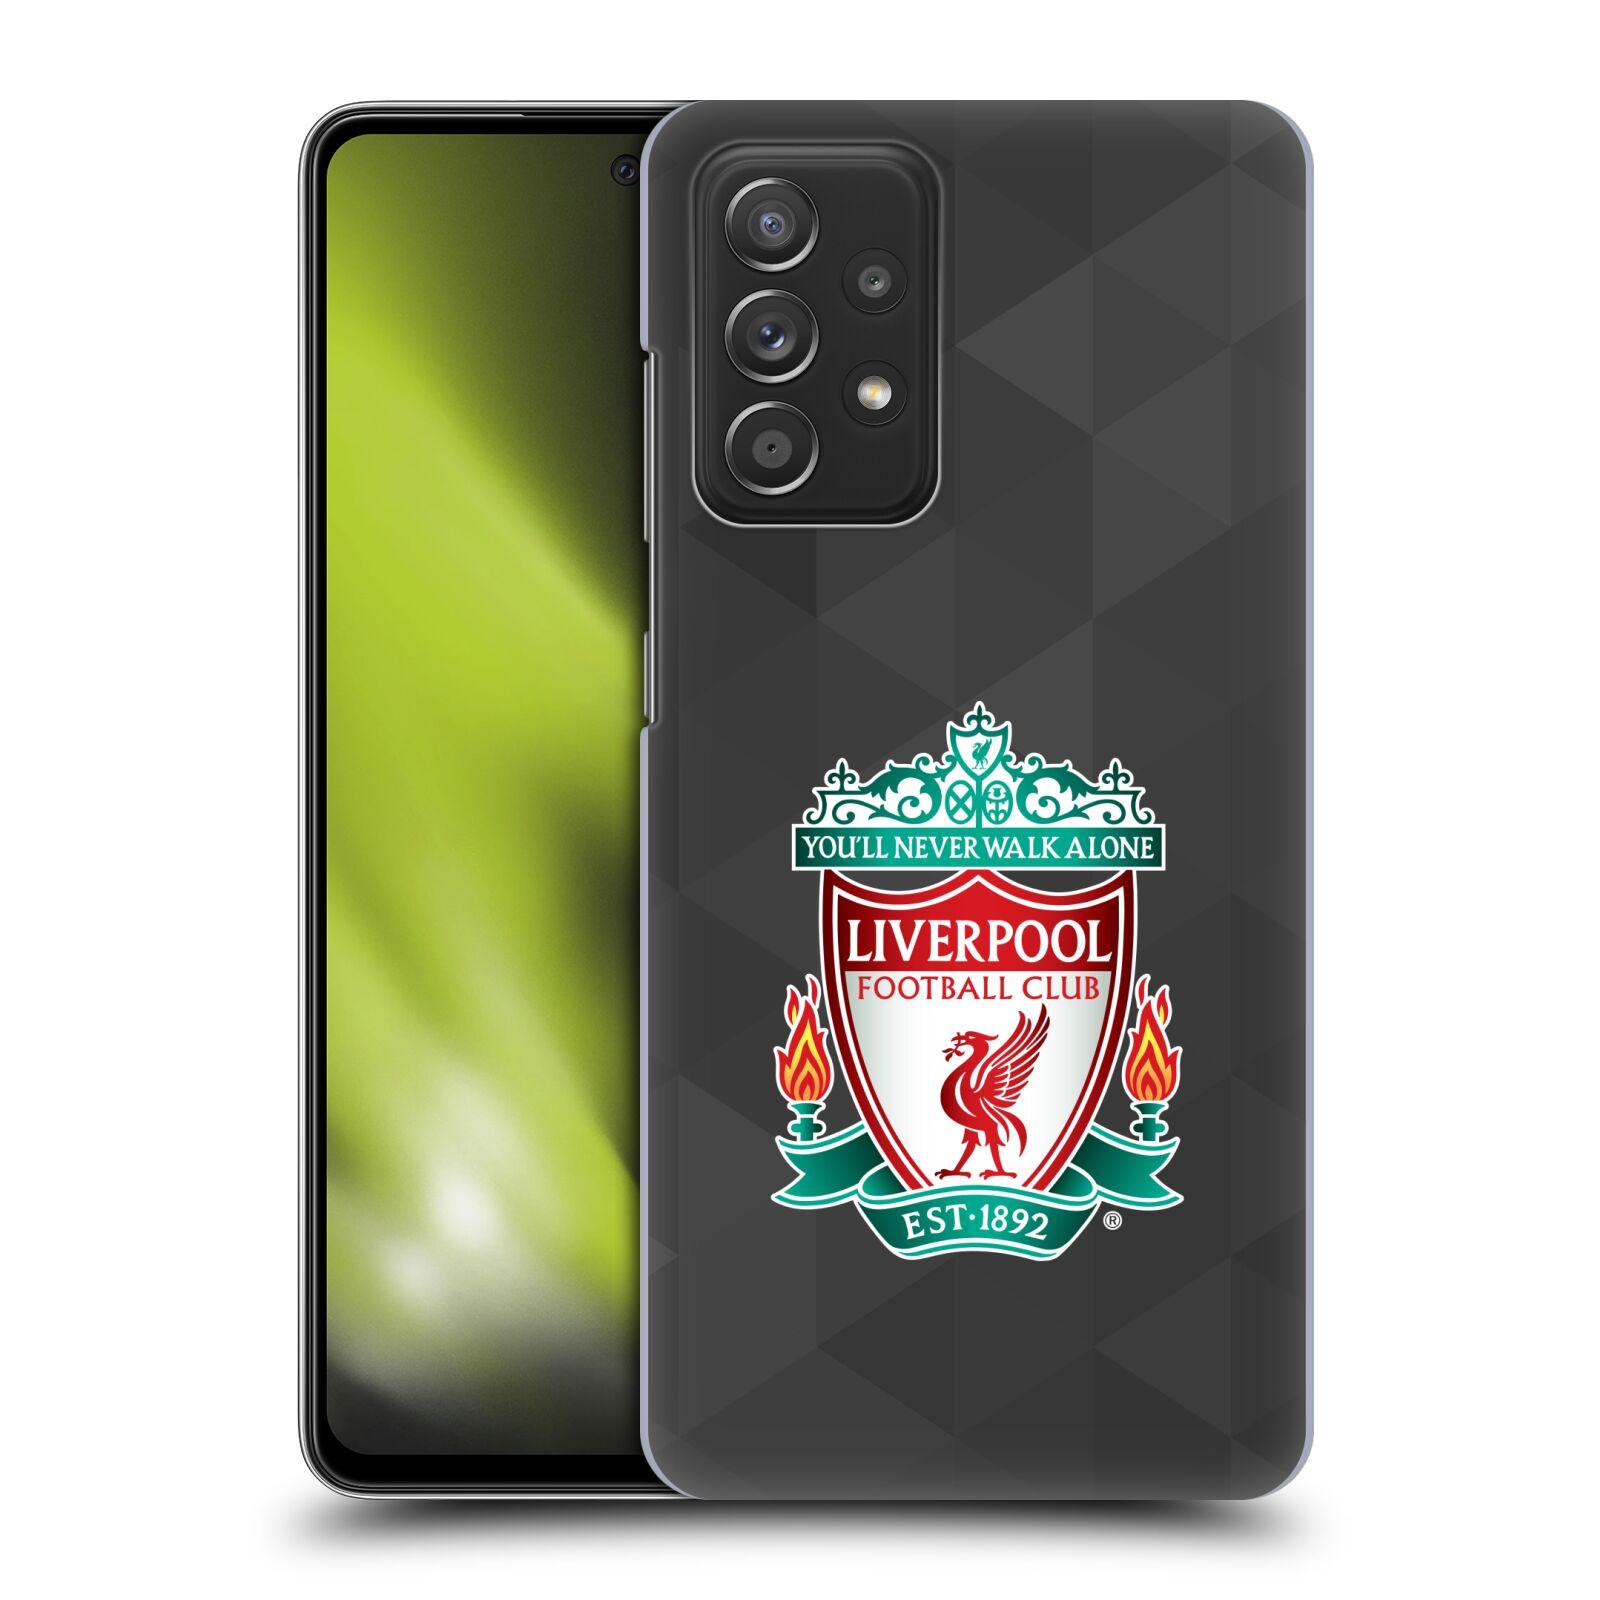 Plastové pouzdro na mobil Samsung Galaxy A52 / A52 5G / A52s 5G - Head Case - ZNAK LIVERPOOL FC OFFICIAL GEOMETRIC BLACK